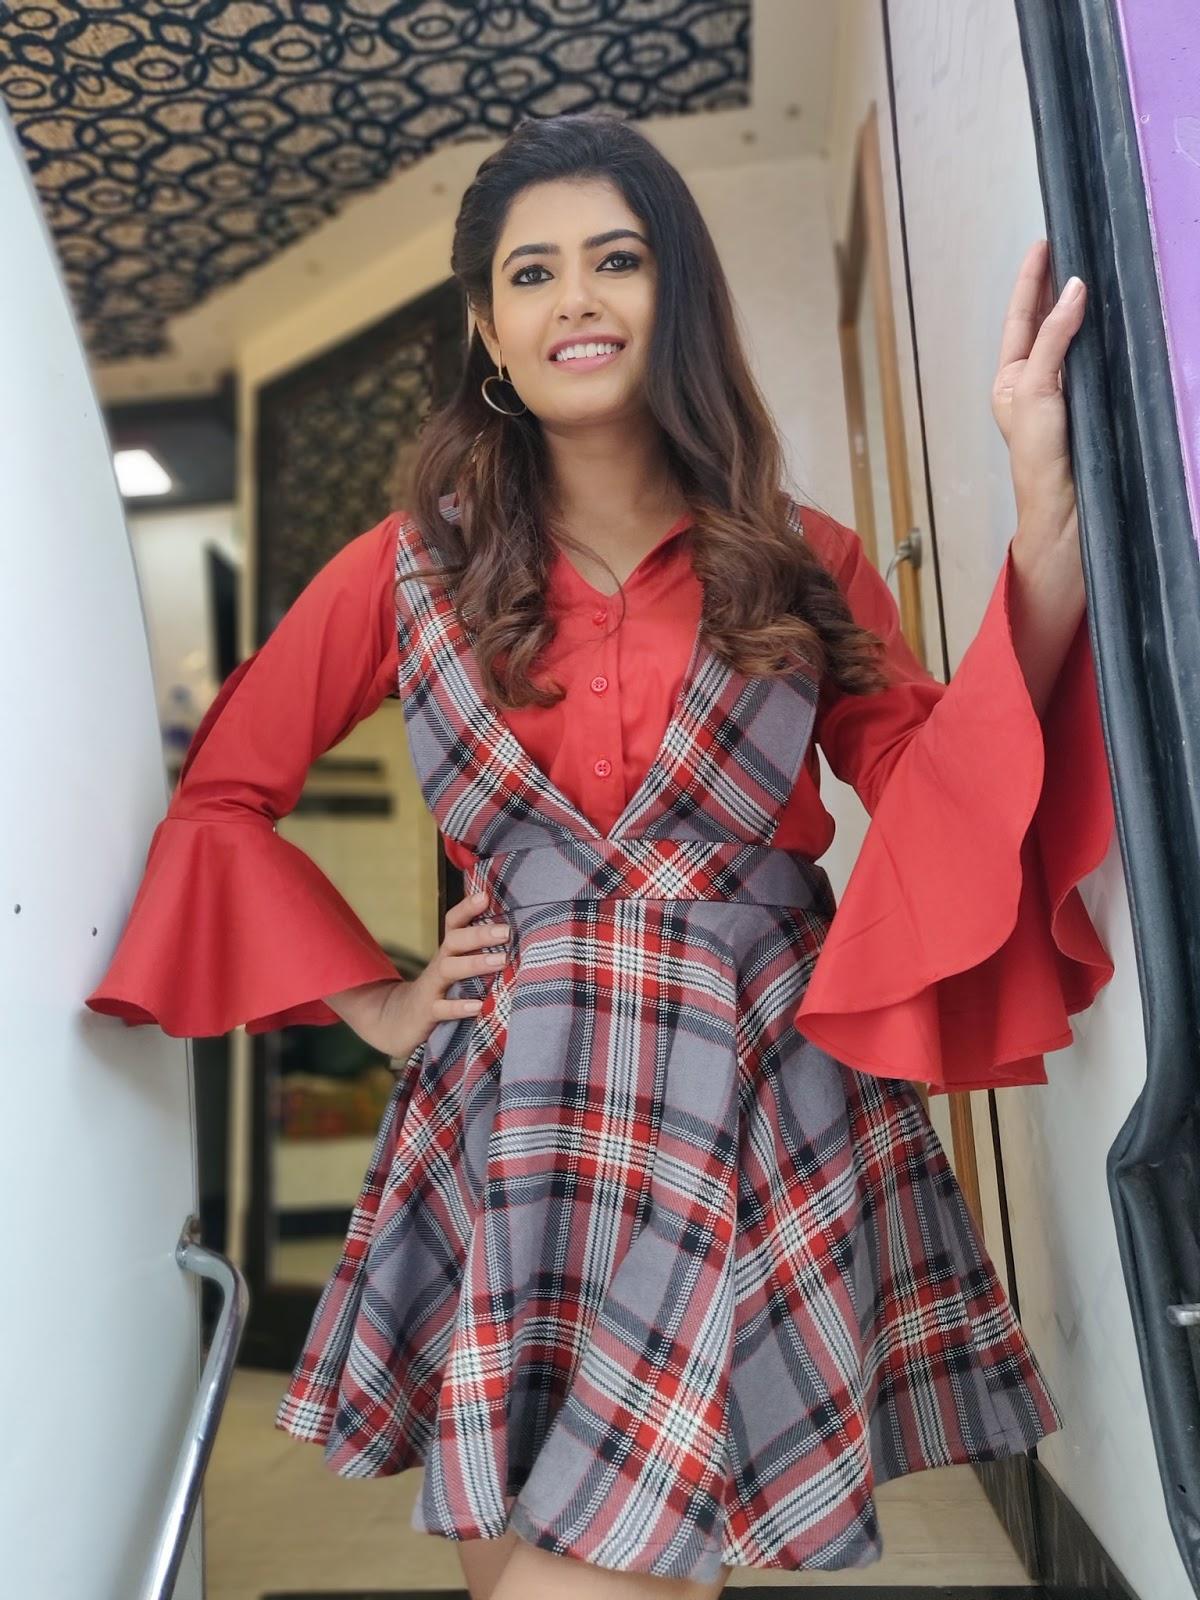 Actress PayalRajput HotPhotos MakeUp BeautyTips Fashion WallPapers Biography Wikipedia MoviesList VideoSongs Photoshoots